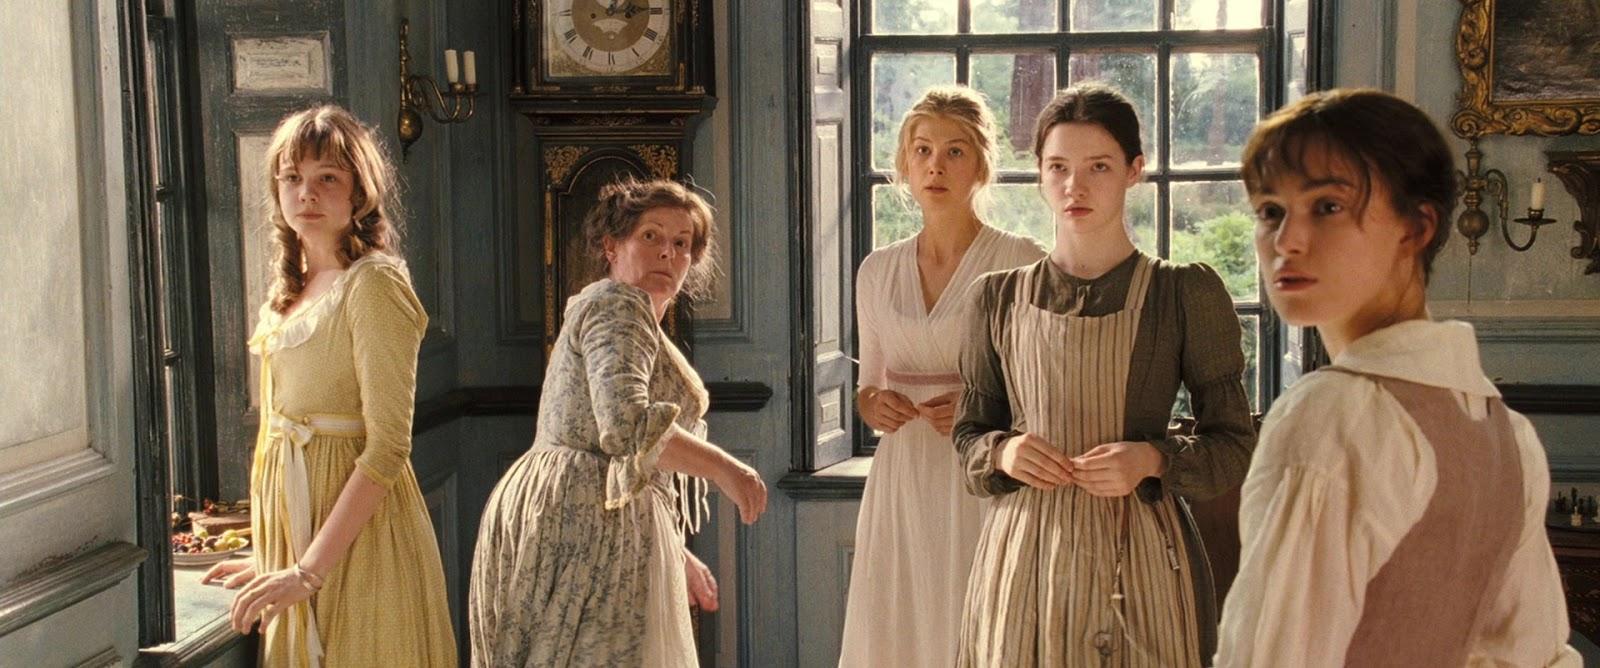 characterization of women in jane austens pride and prejudice